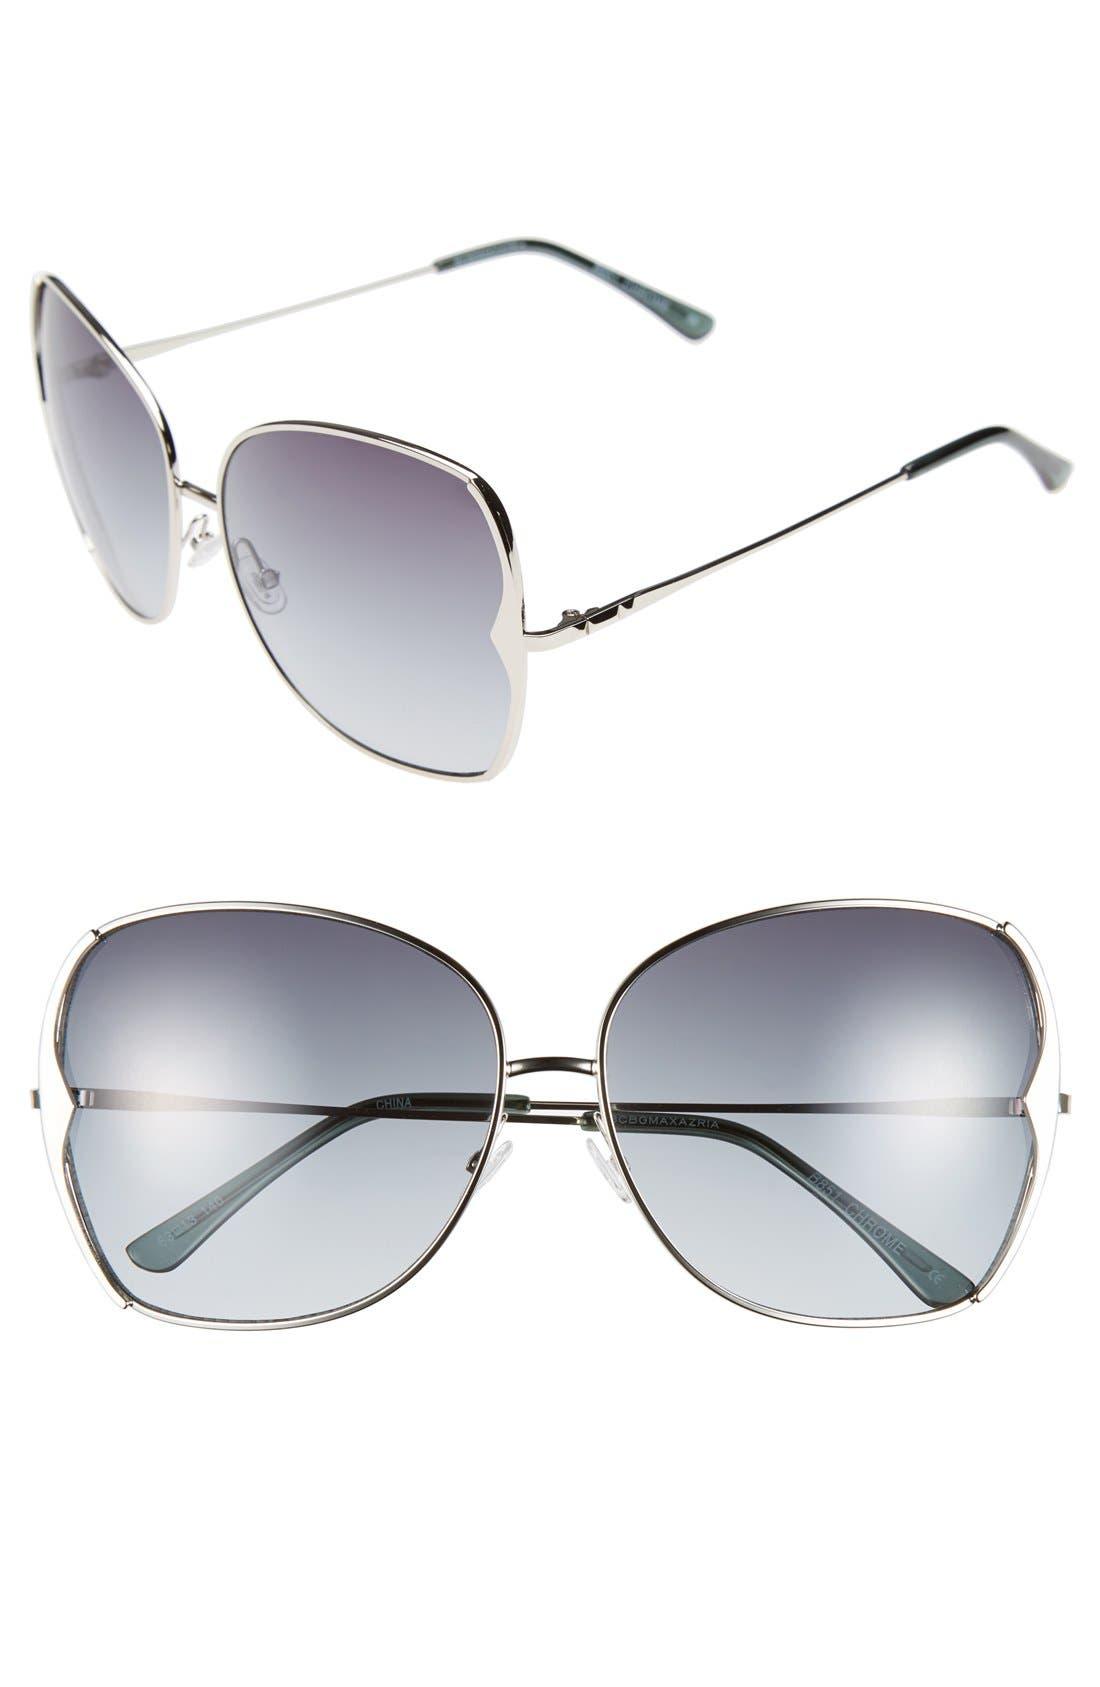 Main Image - BCBGMAXAZRIA 63mm Butterfly Sunglasses